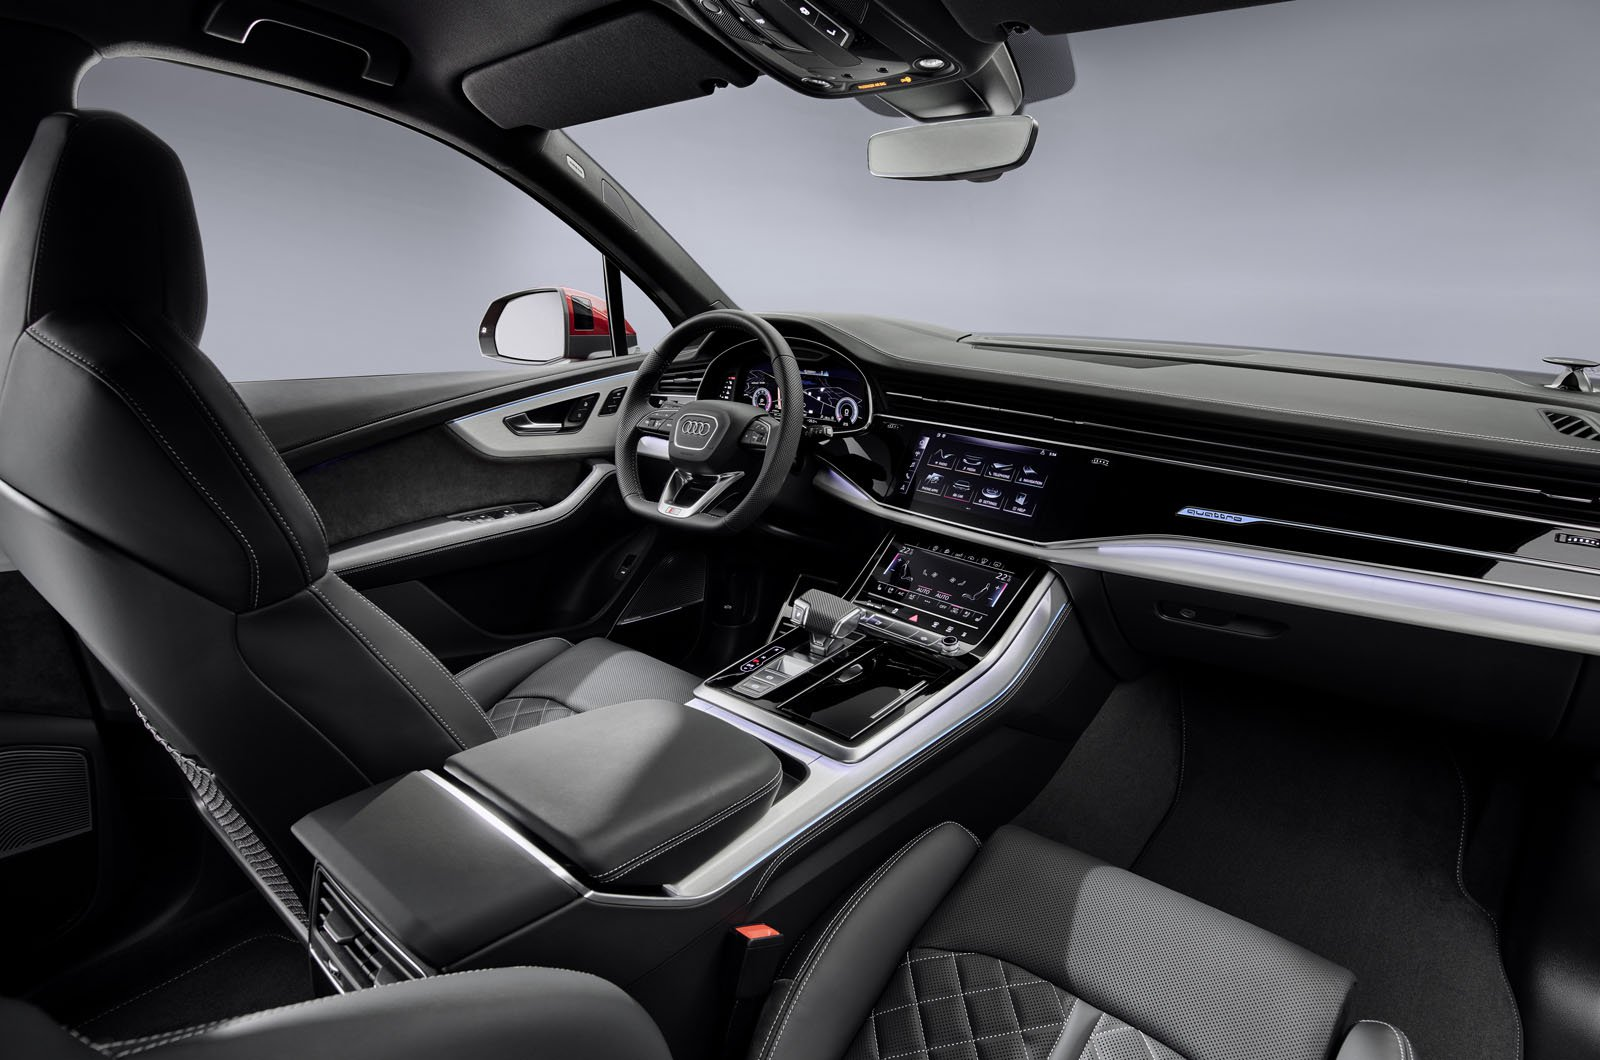 2020 Audi Q7 dashboard